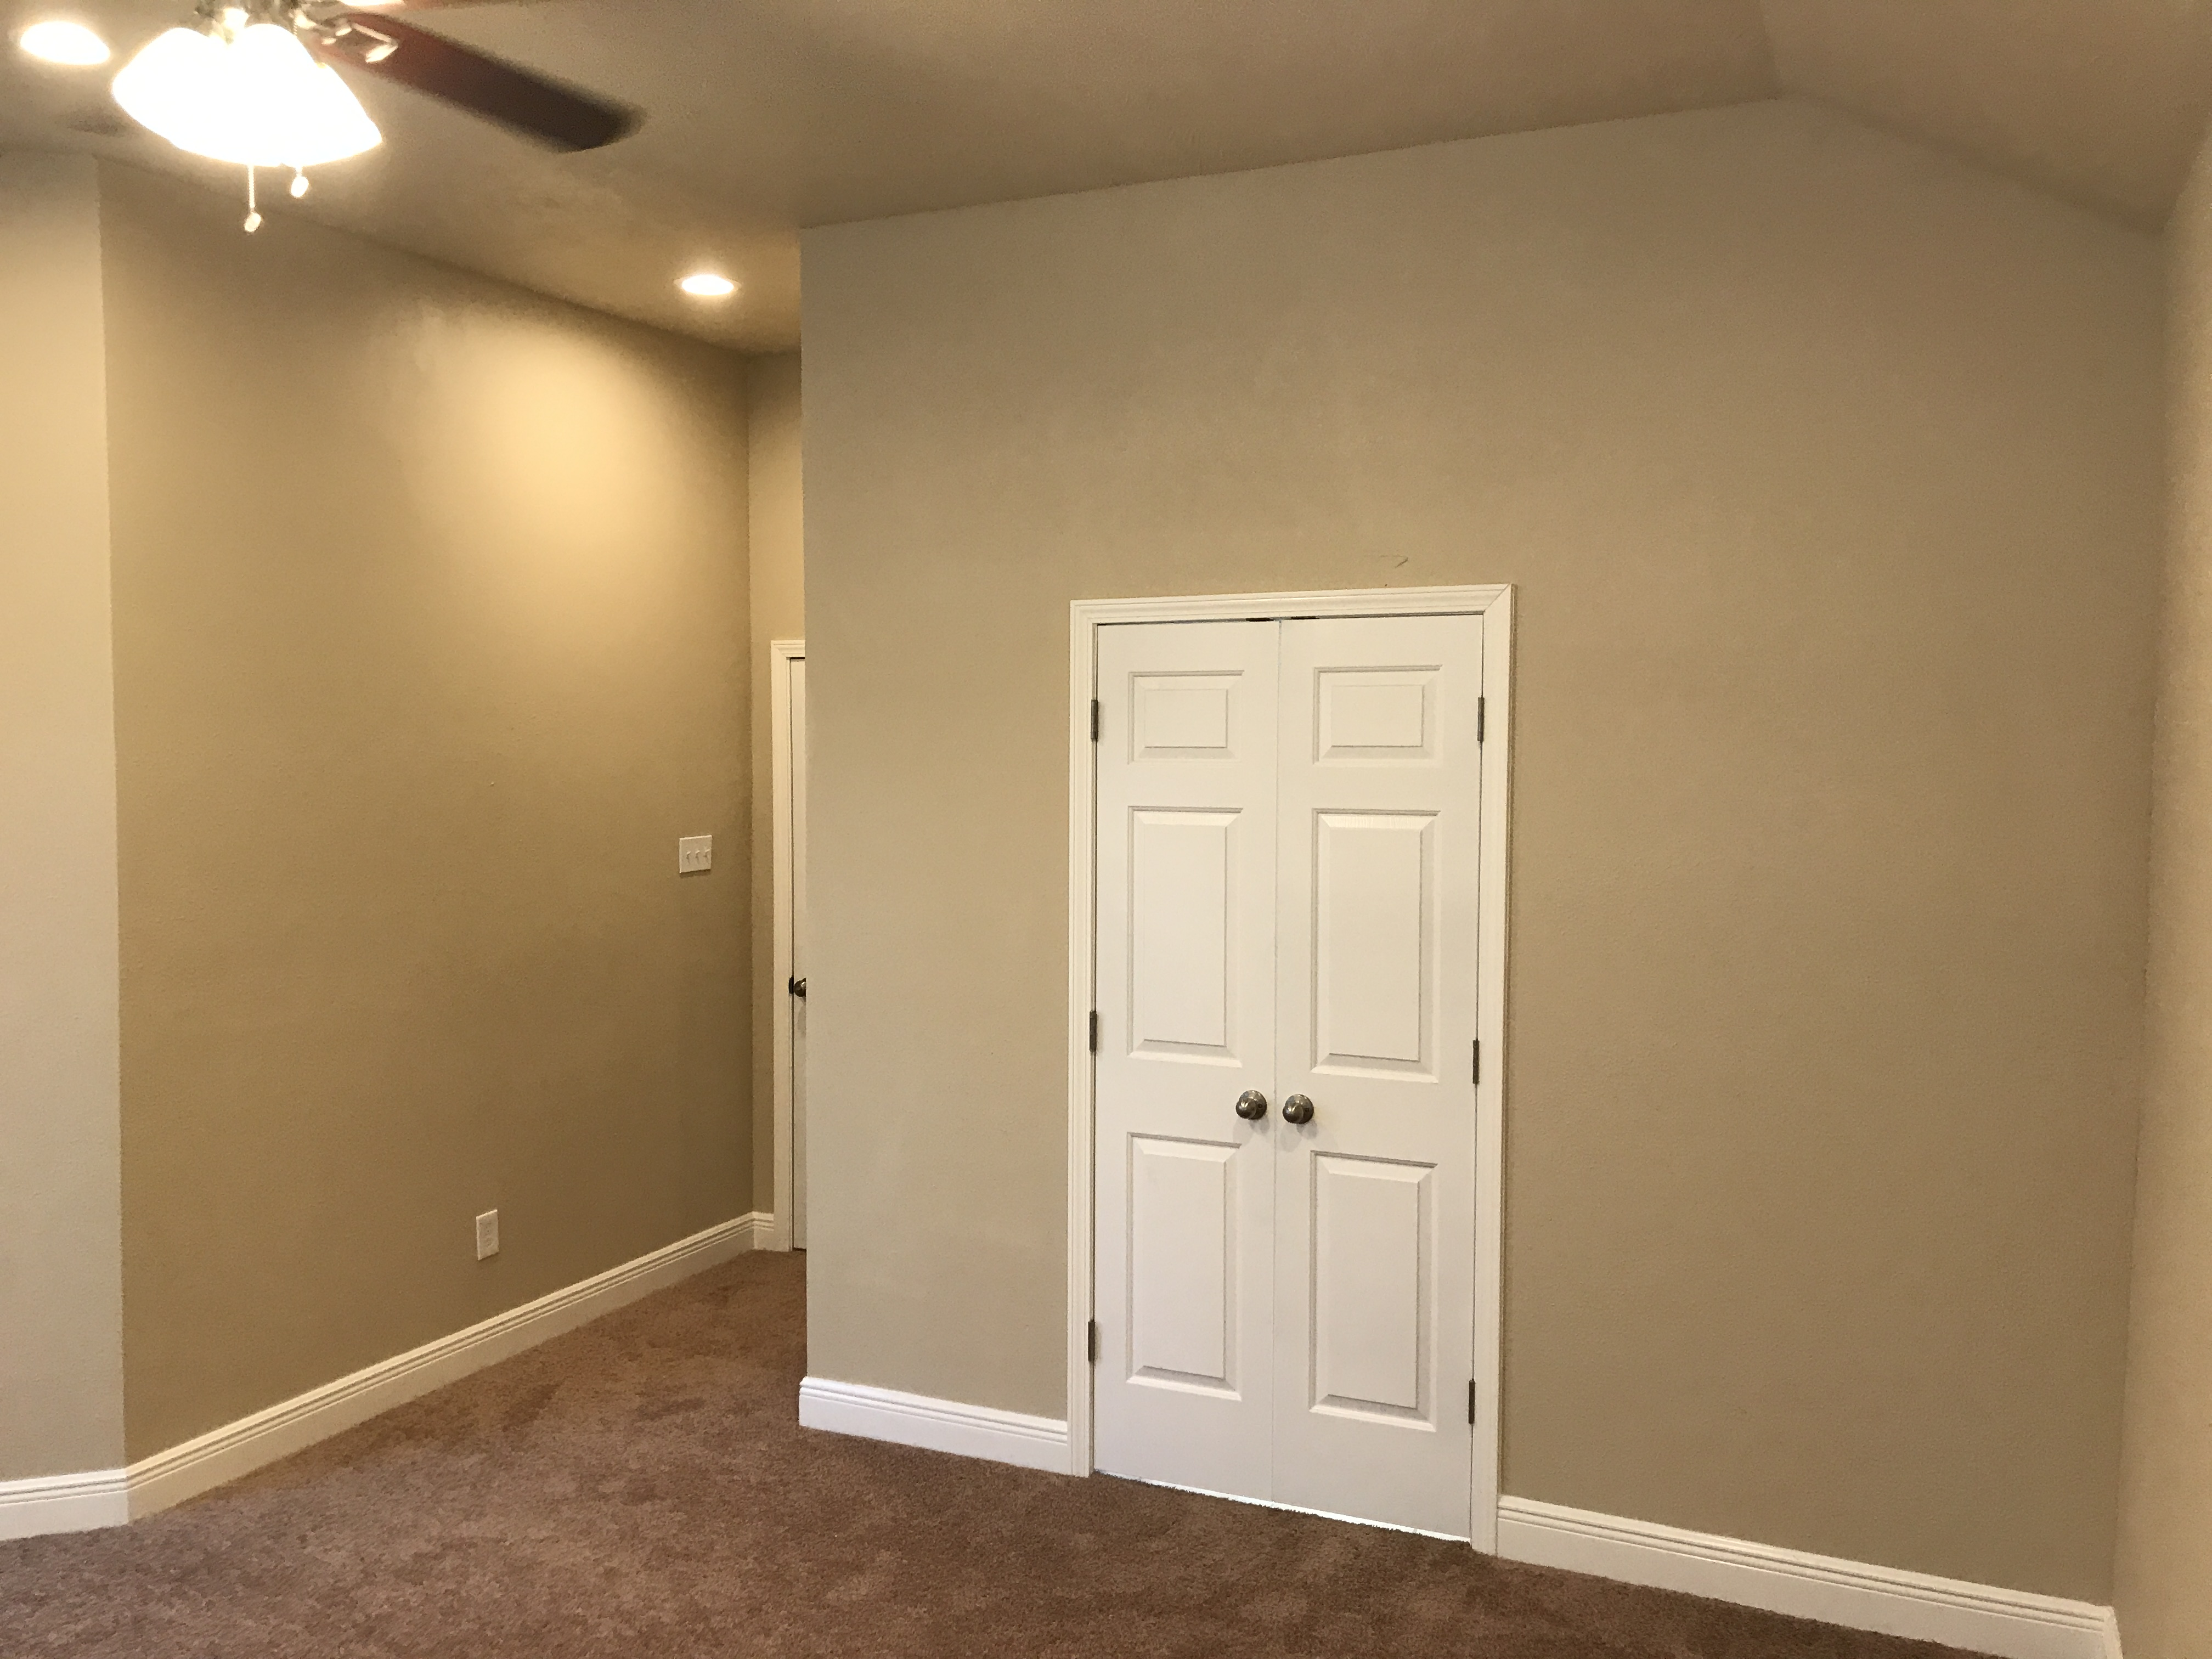 Photo of 307 Marina Oaks Court, League City, TX 77565